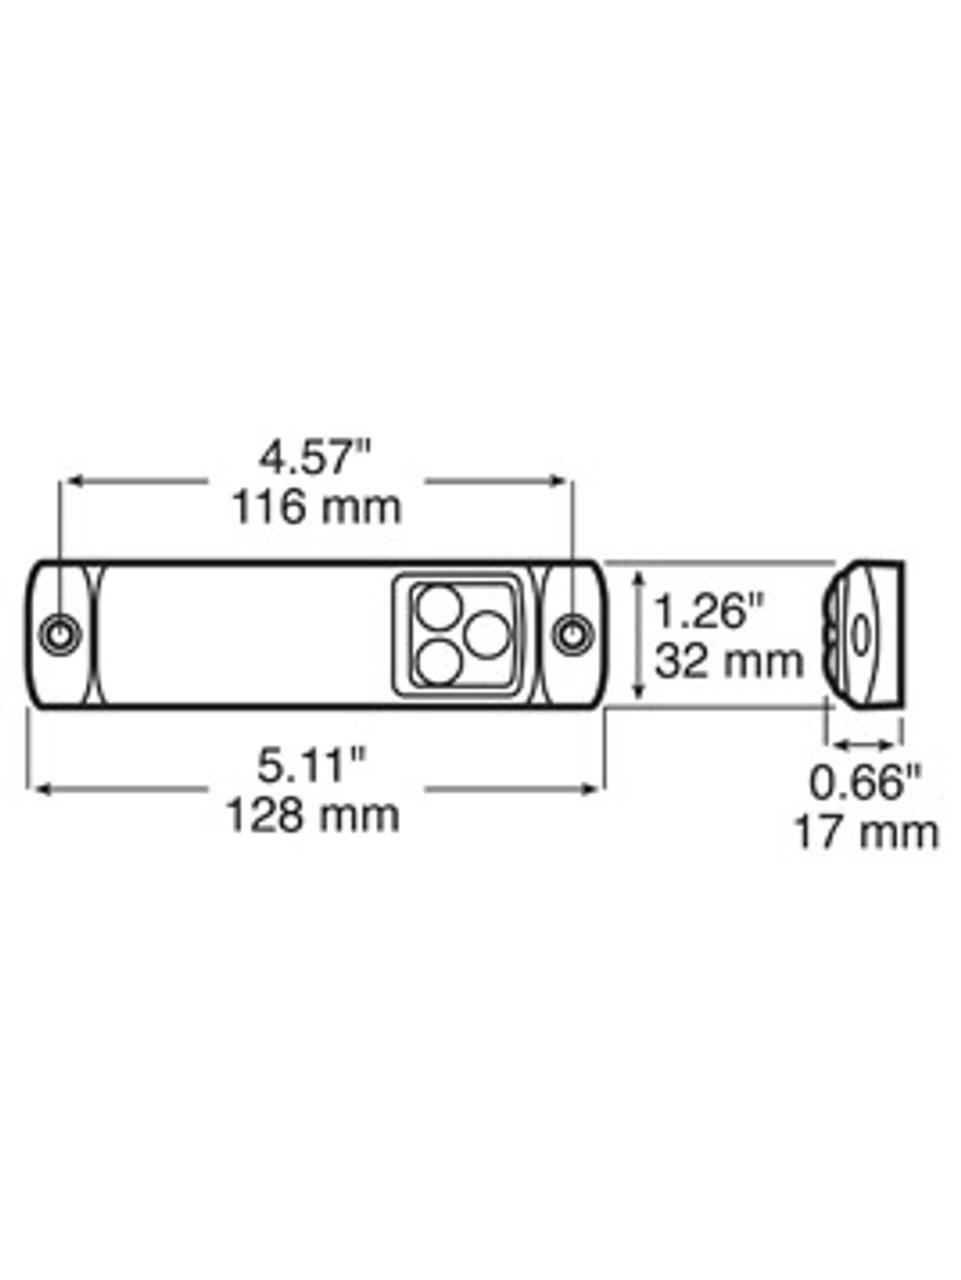 LED1203R3 --- Rectangular Sealed LED Clearance/Side Marker Light with Reflex - 3 Diodes